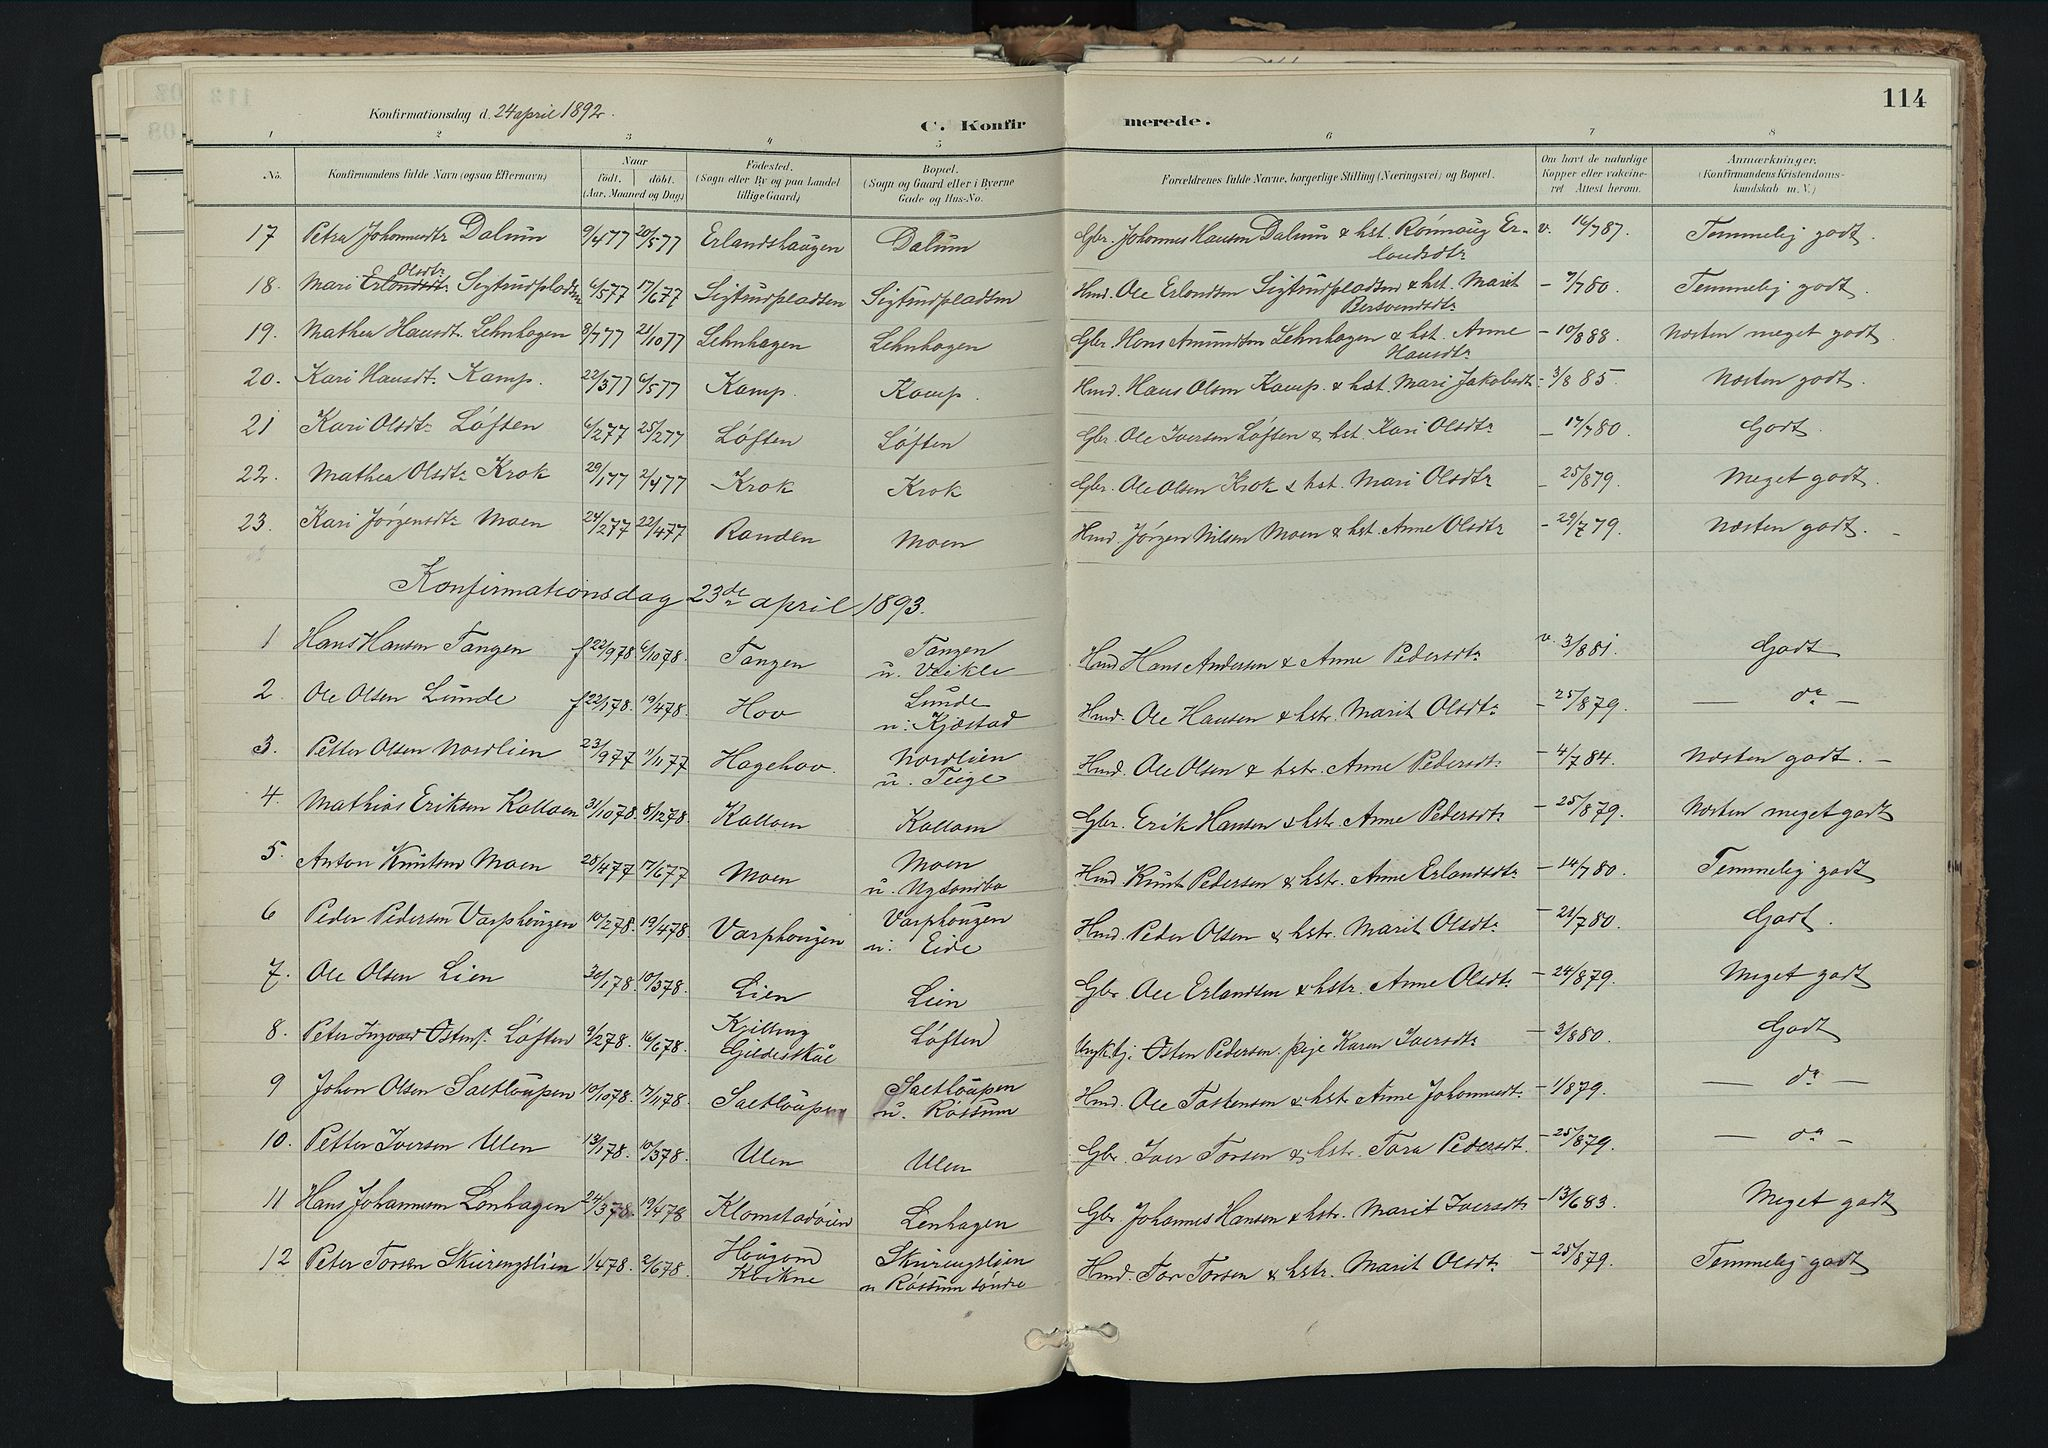 SAH, Nord-Fron prestekontor, Ministerialbok nr. 3, 1884-1914, s. 114